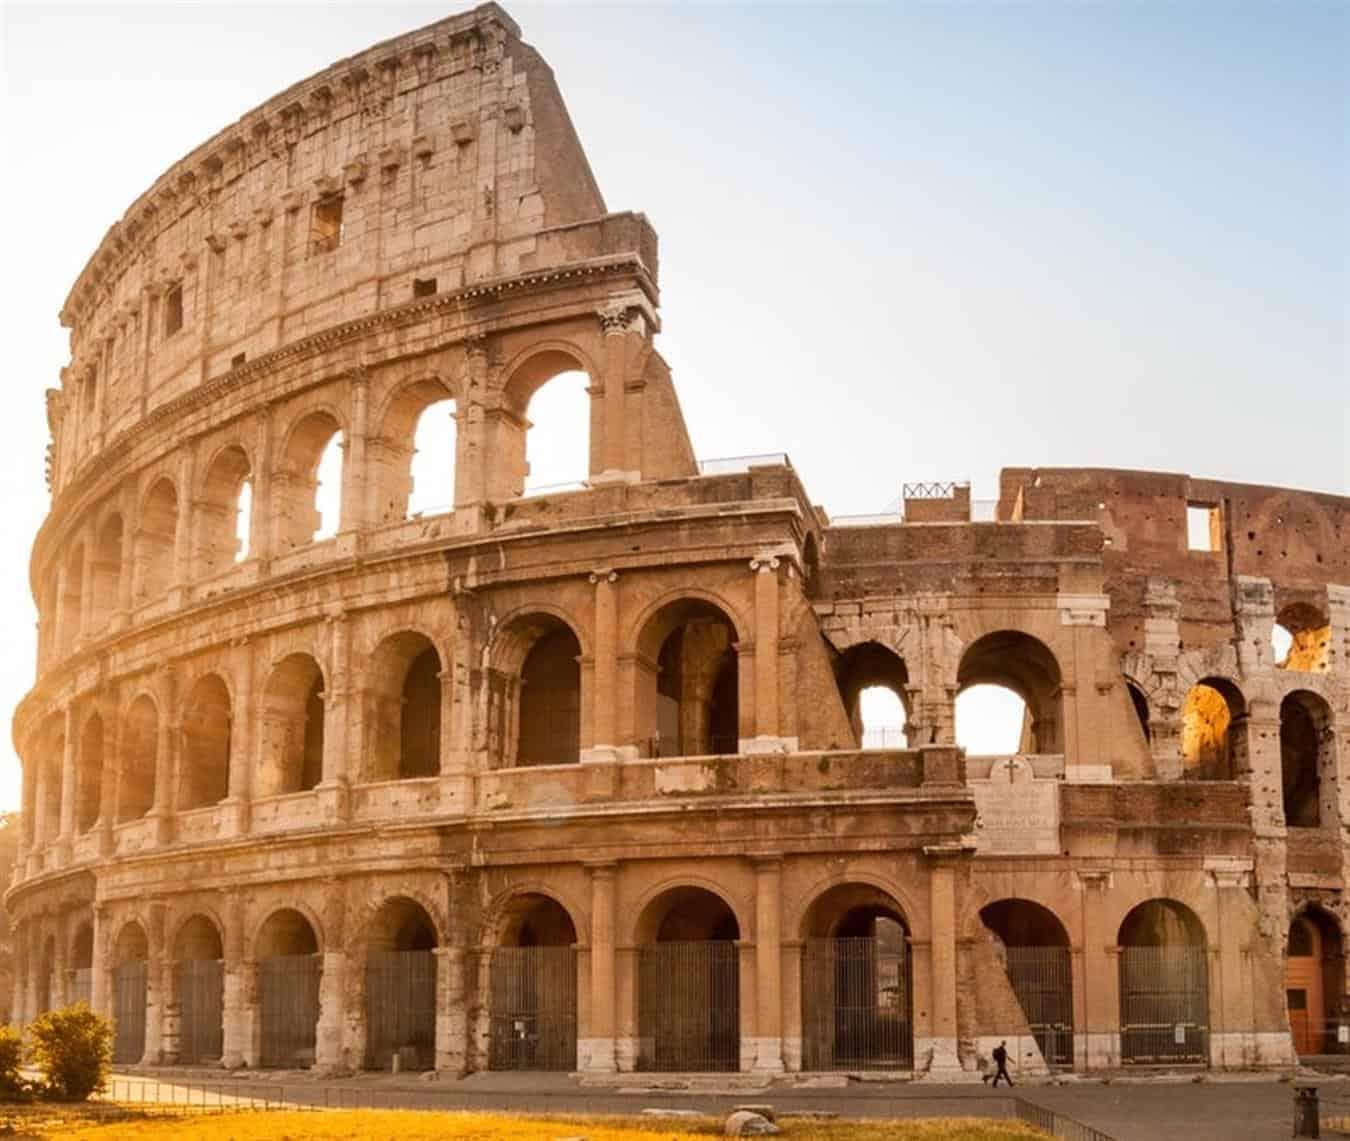 Forgotten Technologies - Roman Concrete